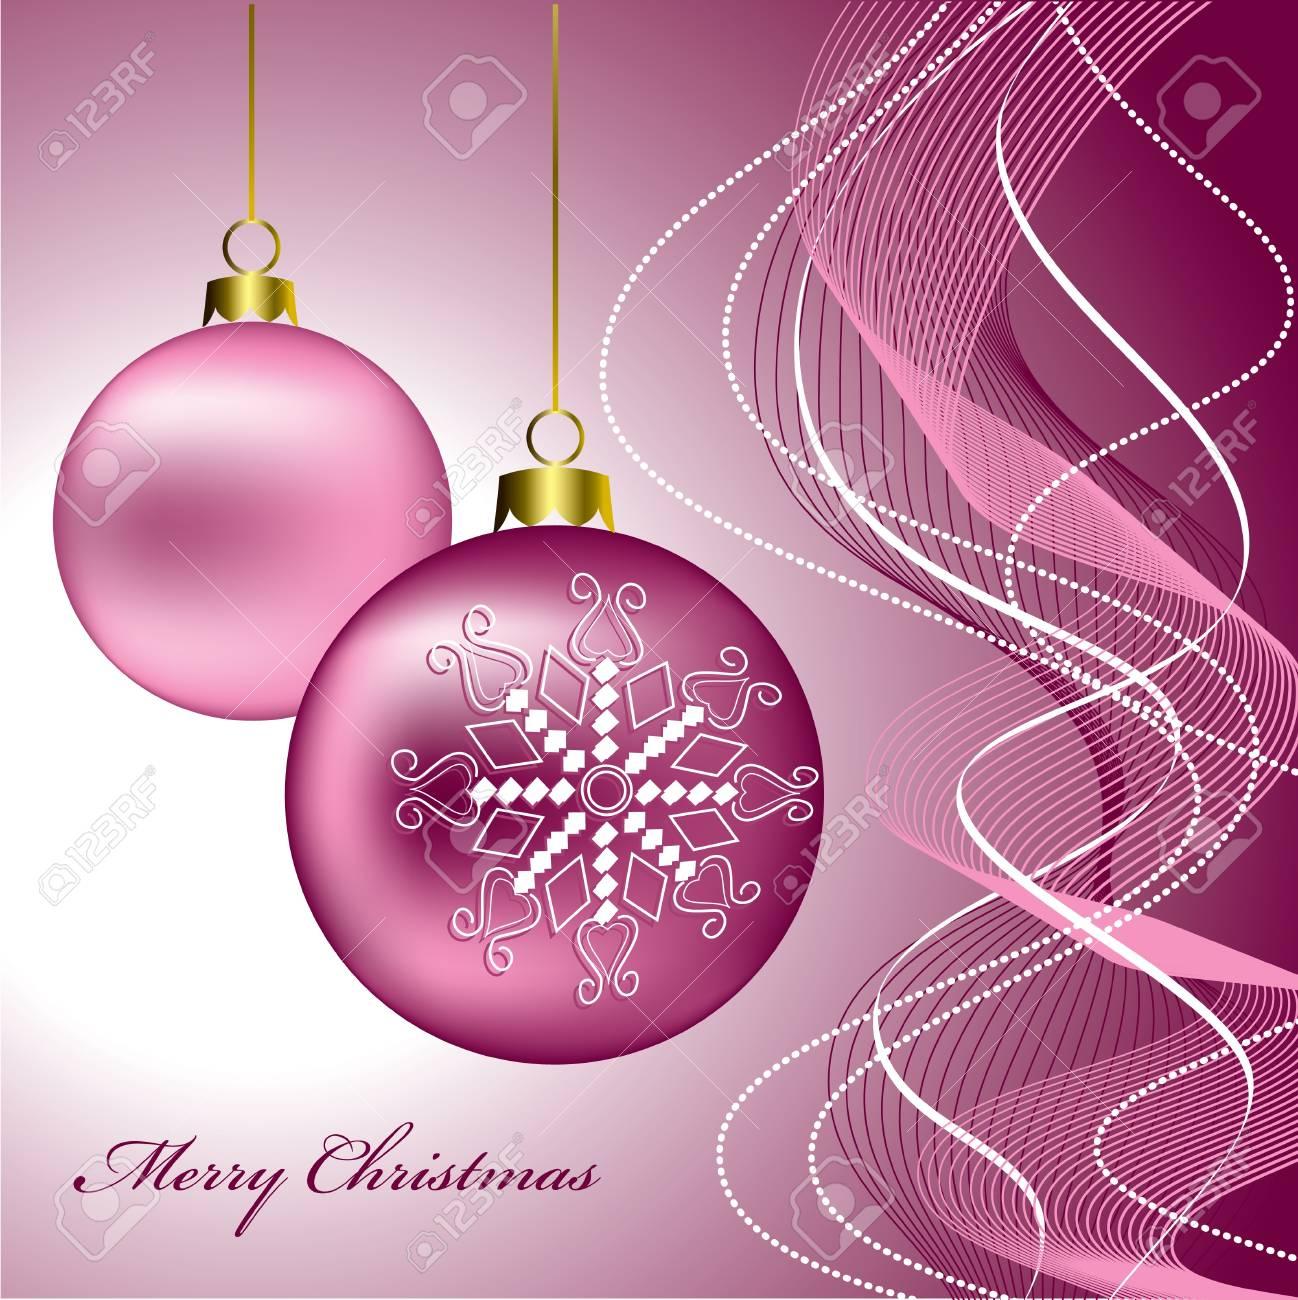 Christmas Background  Vector Illustration  eps10 Stock Vector - 14985694